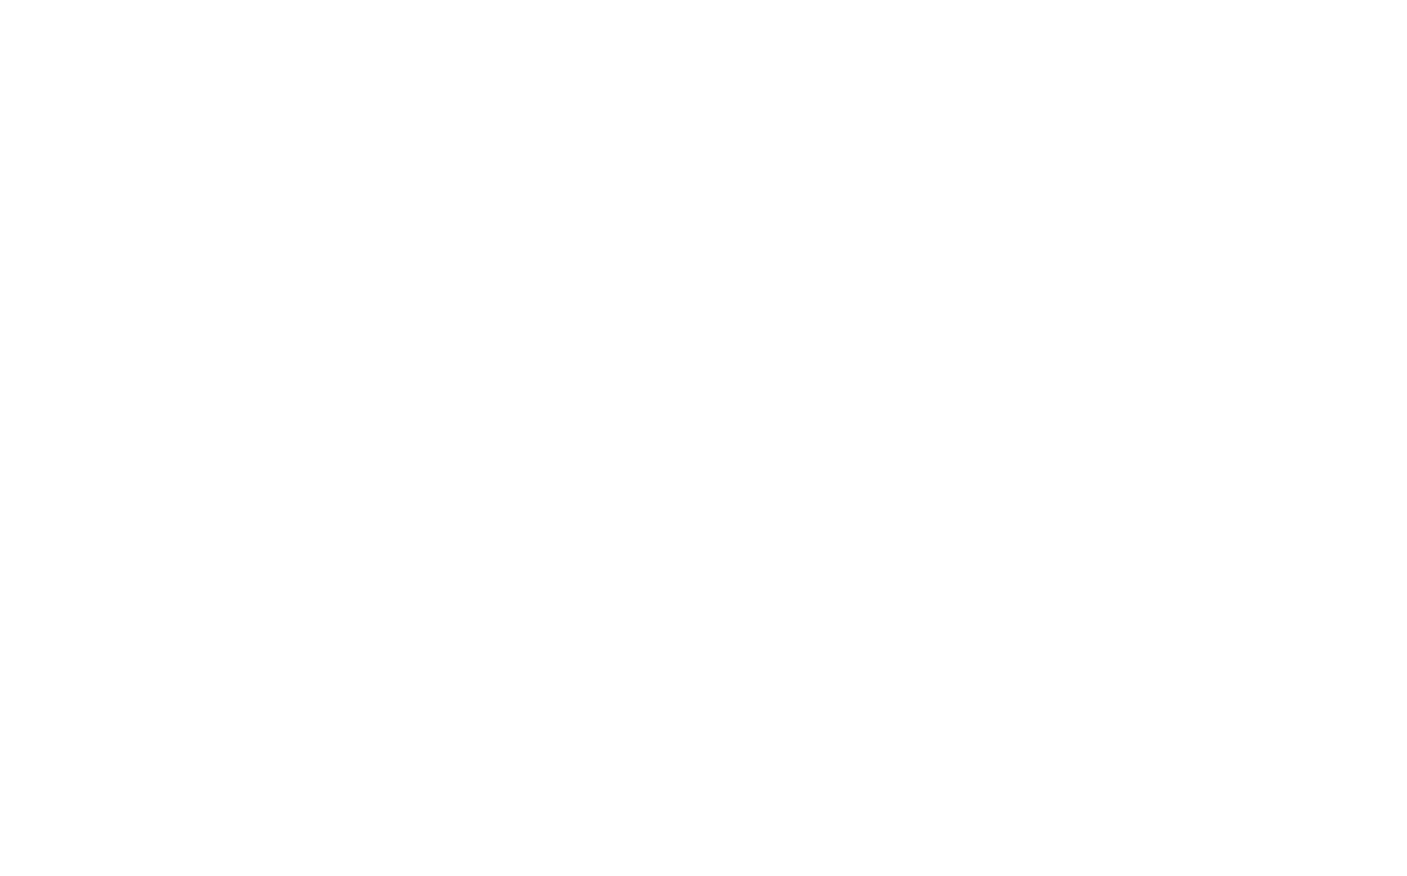 J & K Cabinetry